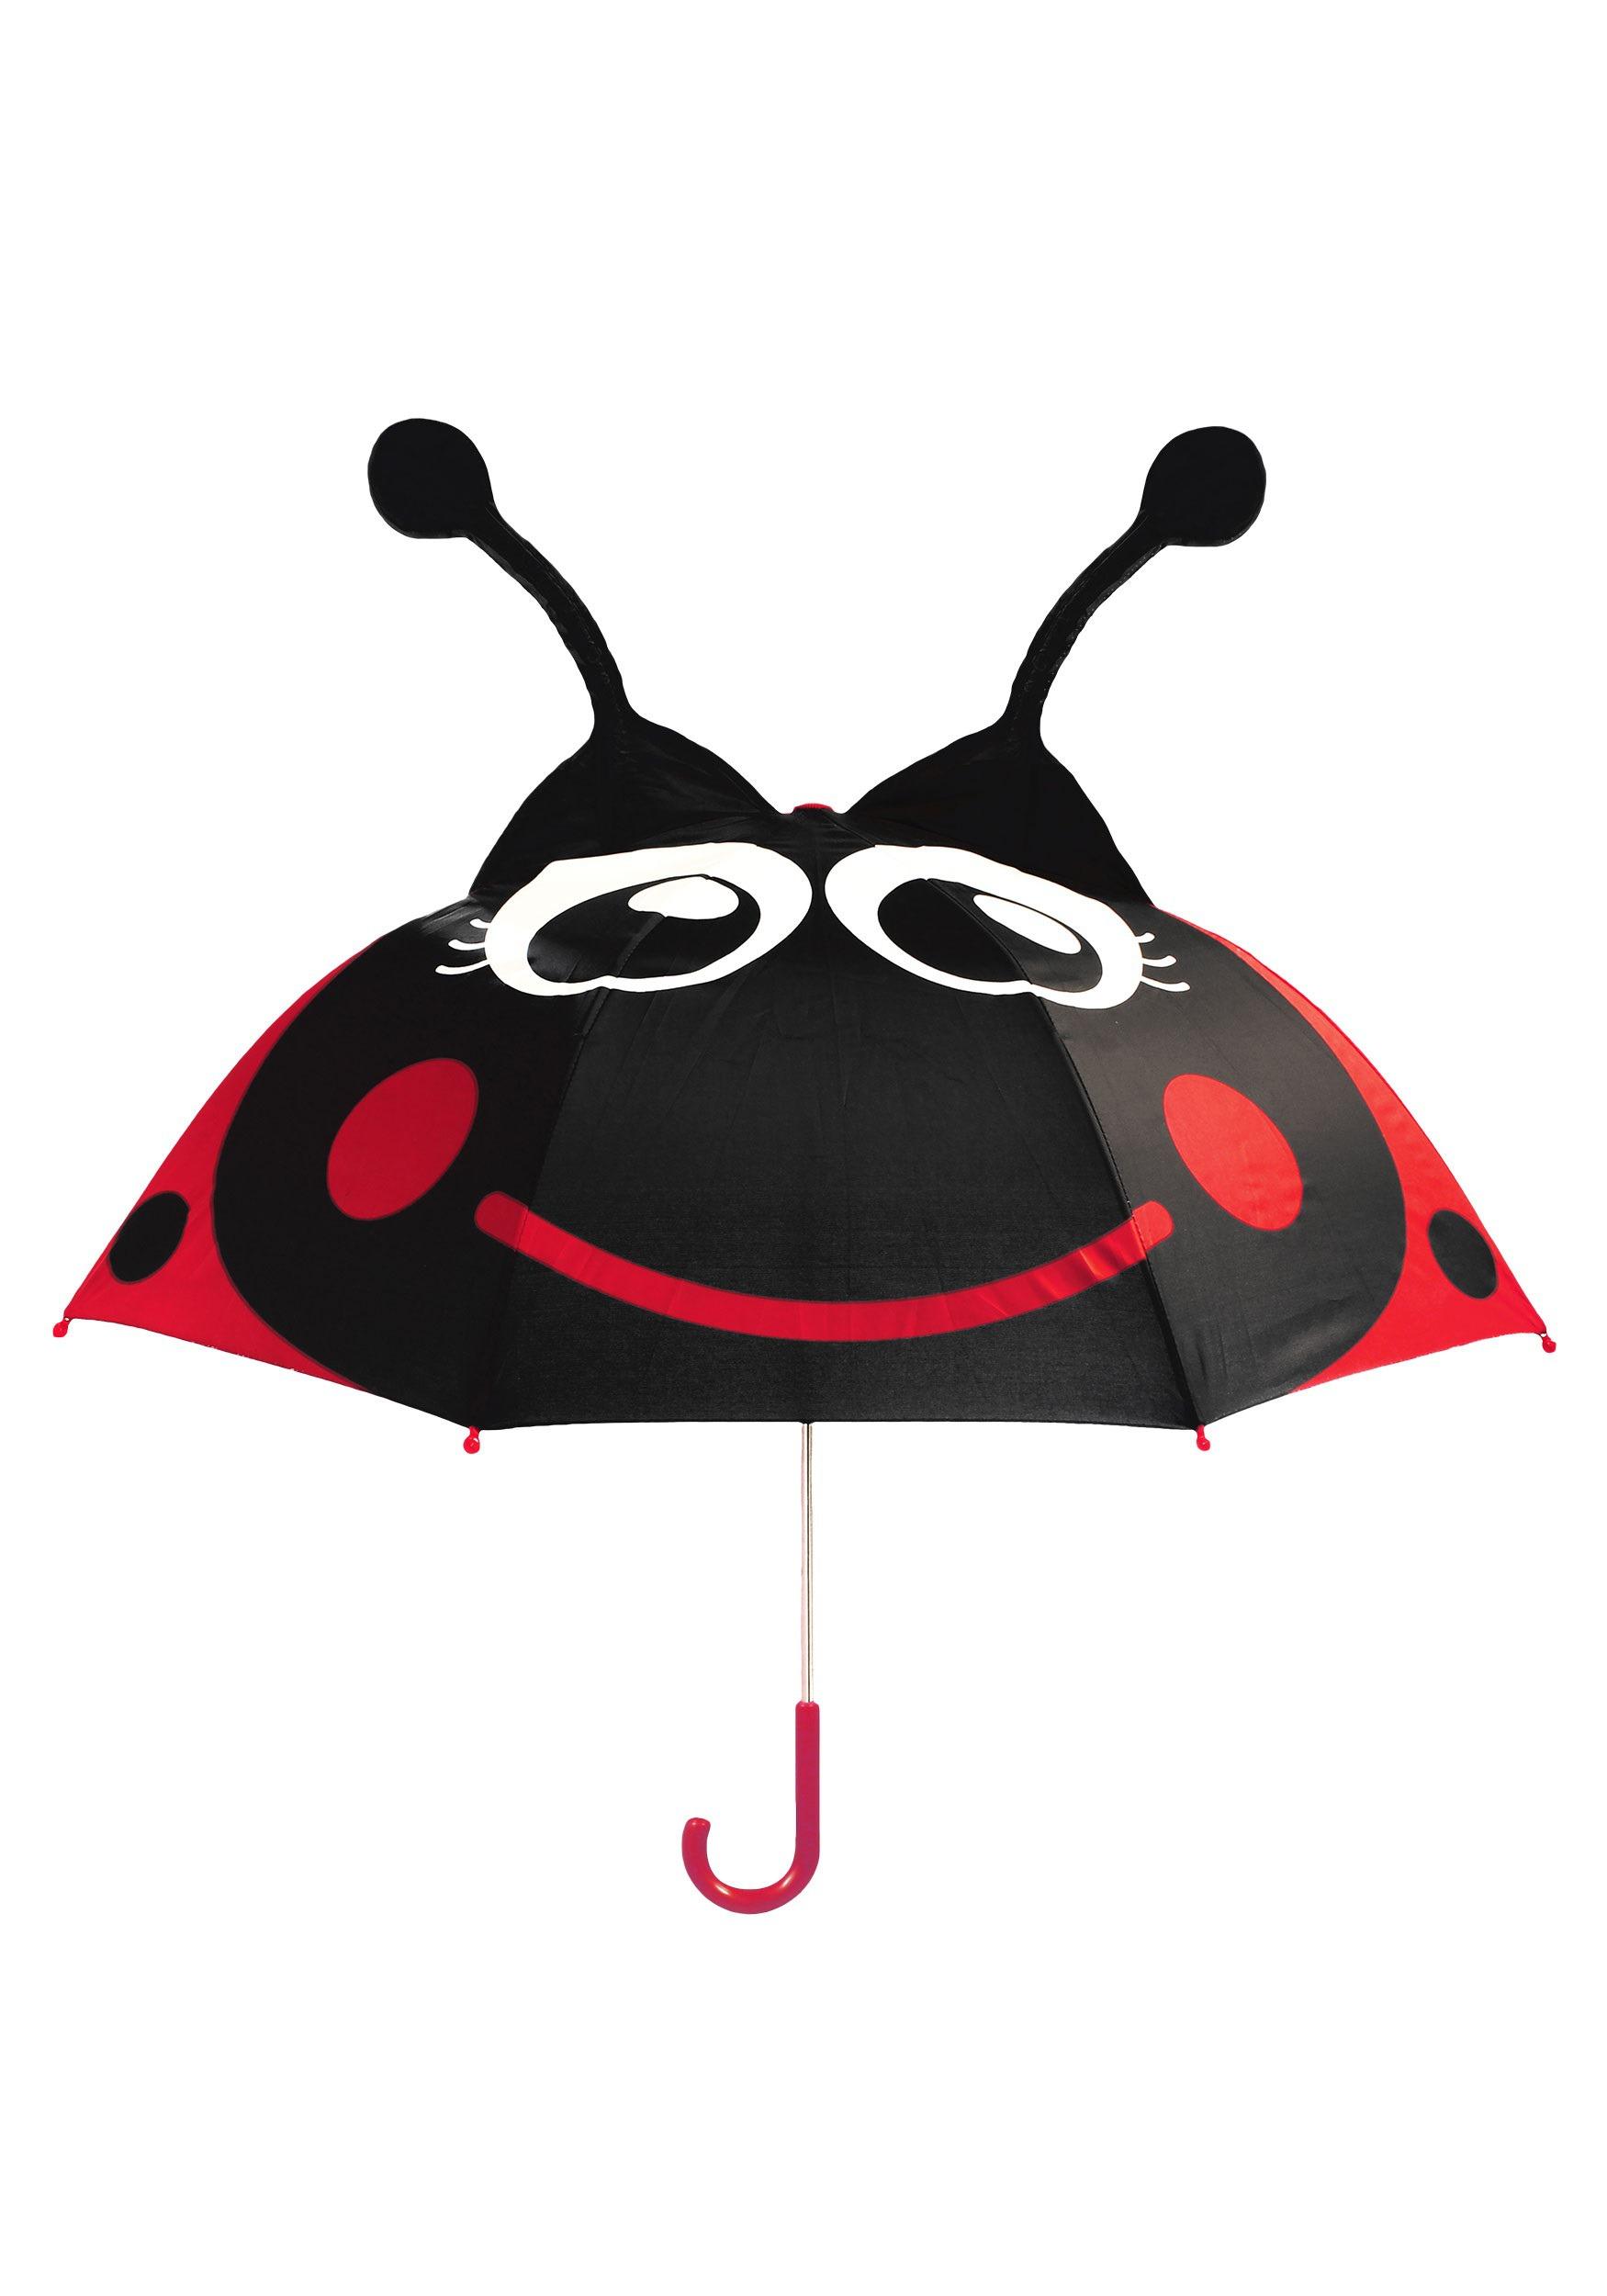 red ladybug umbrella